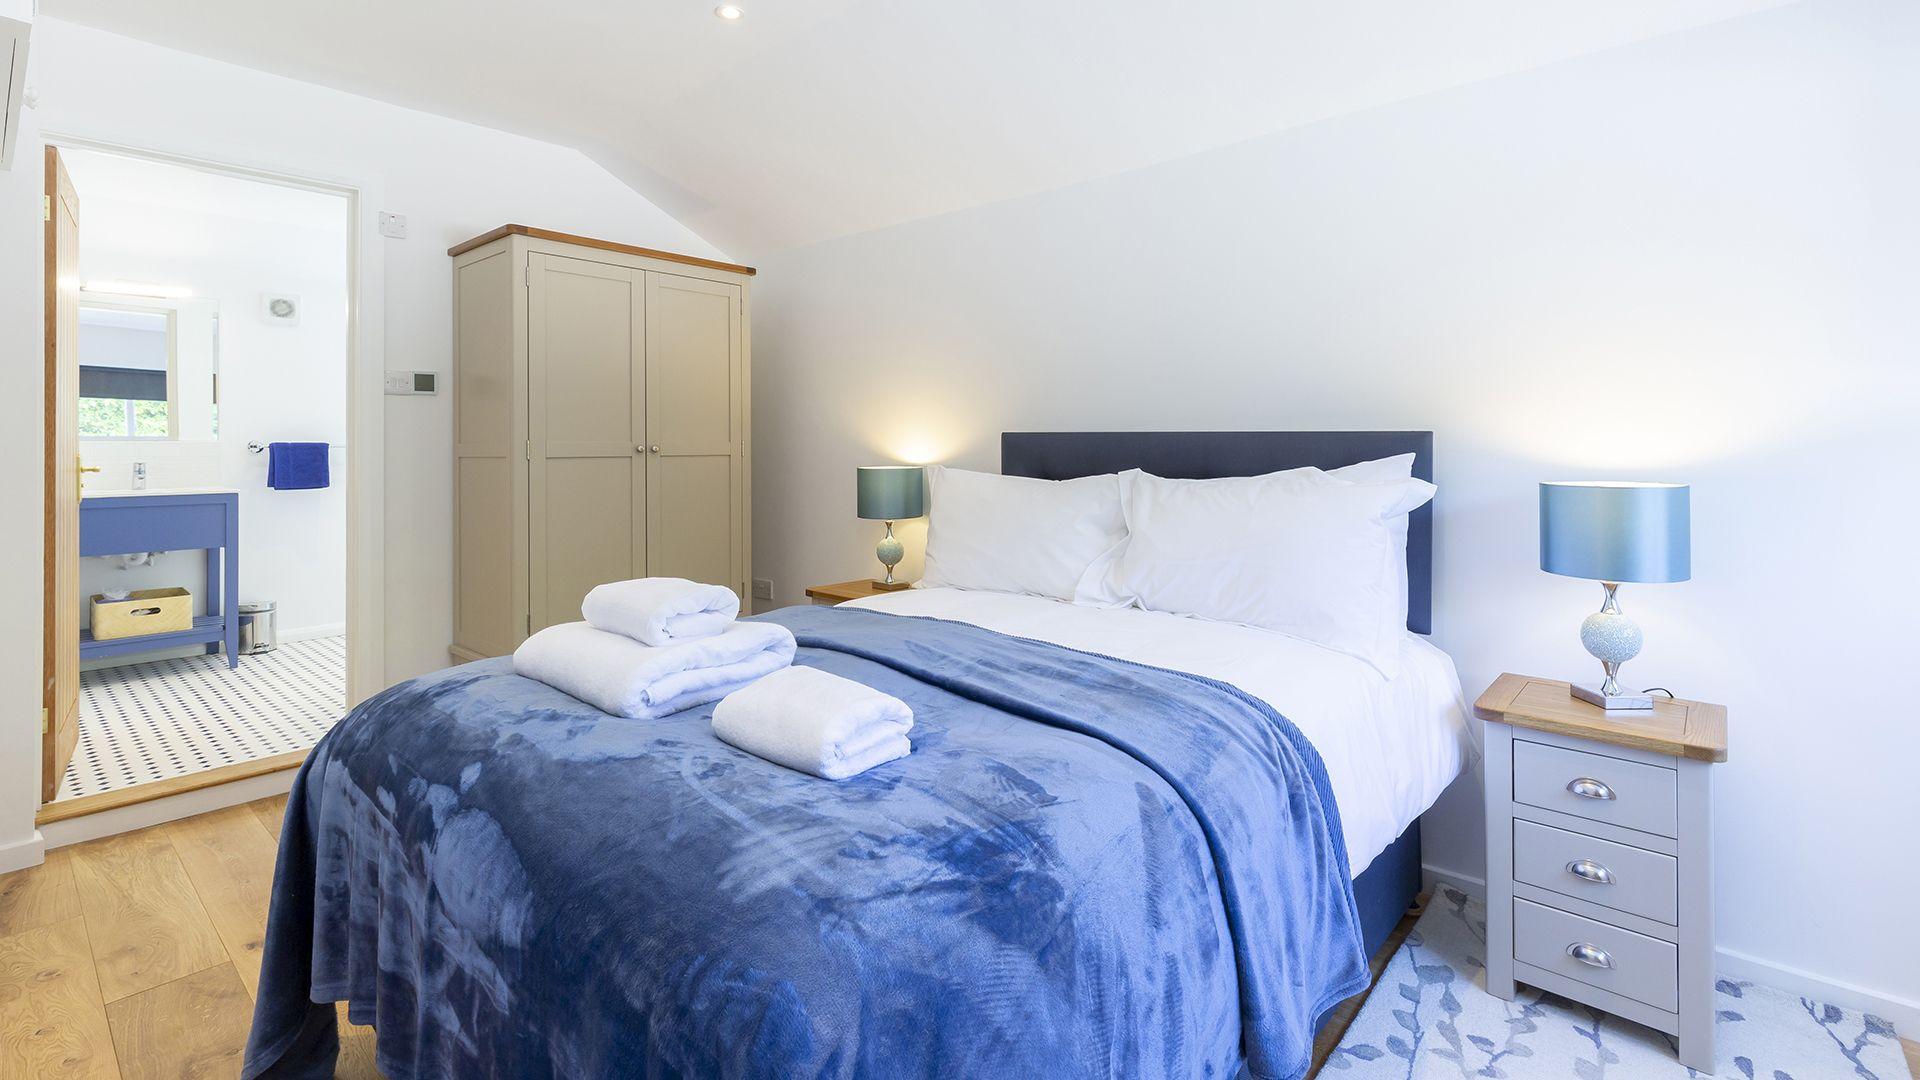 Bedroom 1 with en-suite, South Winds, Bolthole Retreats